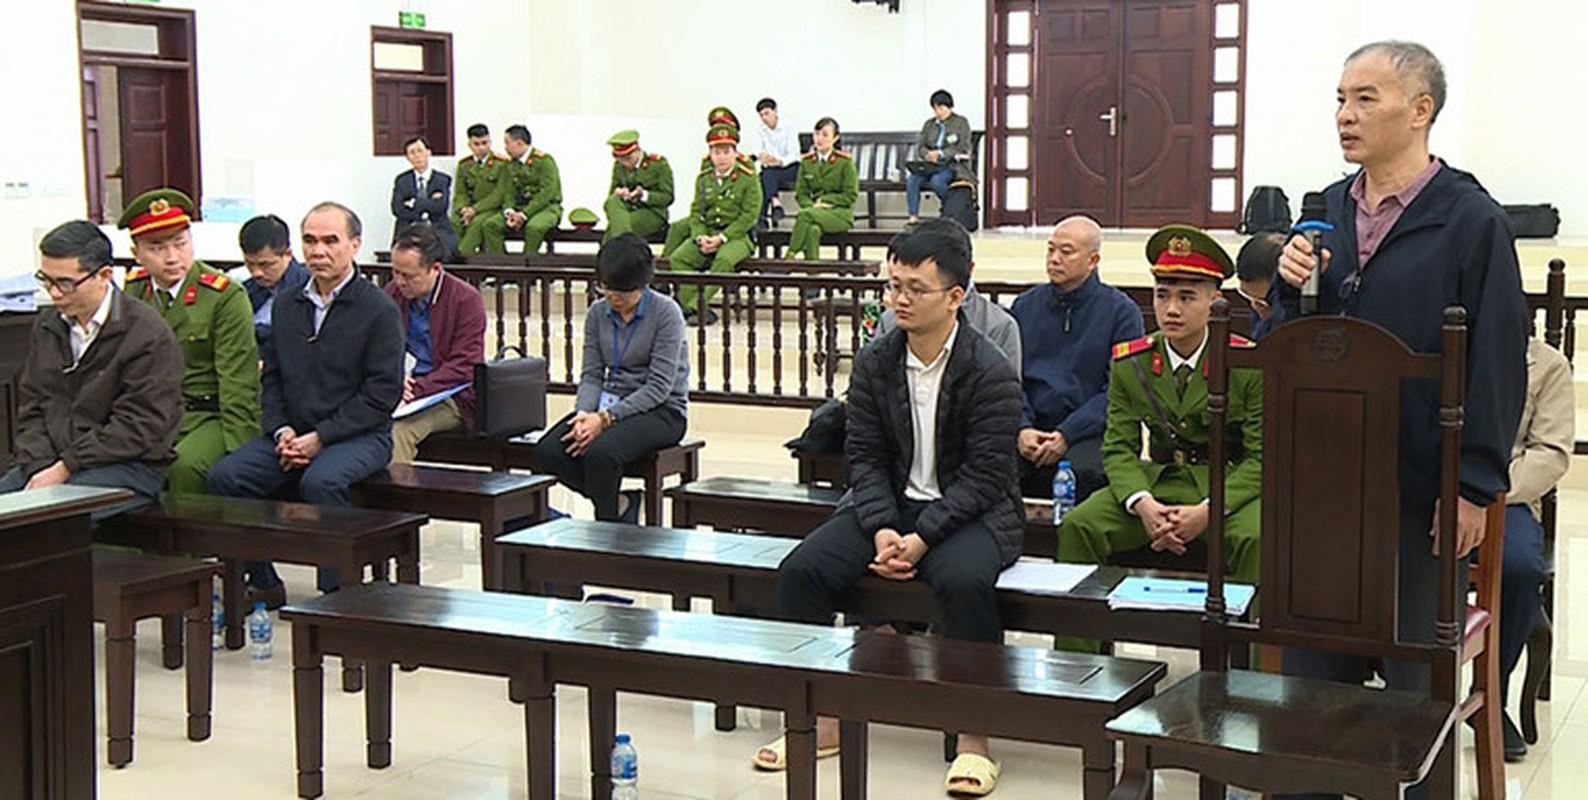 Vu AVG: Le Nam Tra khoc, ong Nguyen Bac Son, Truong Minh Tuan cui dau xau ho tai toa vi nhan hoi lo-Hinh-6